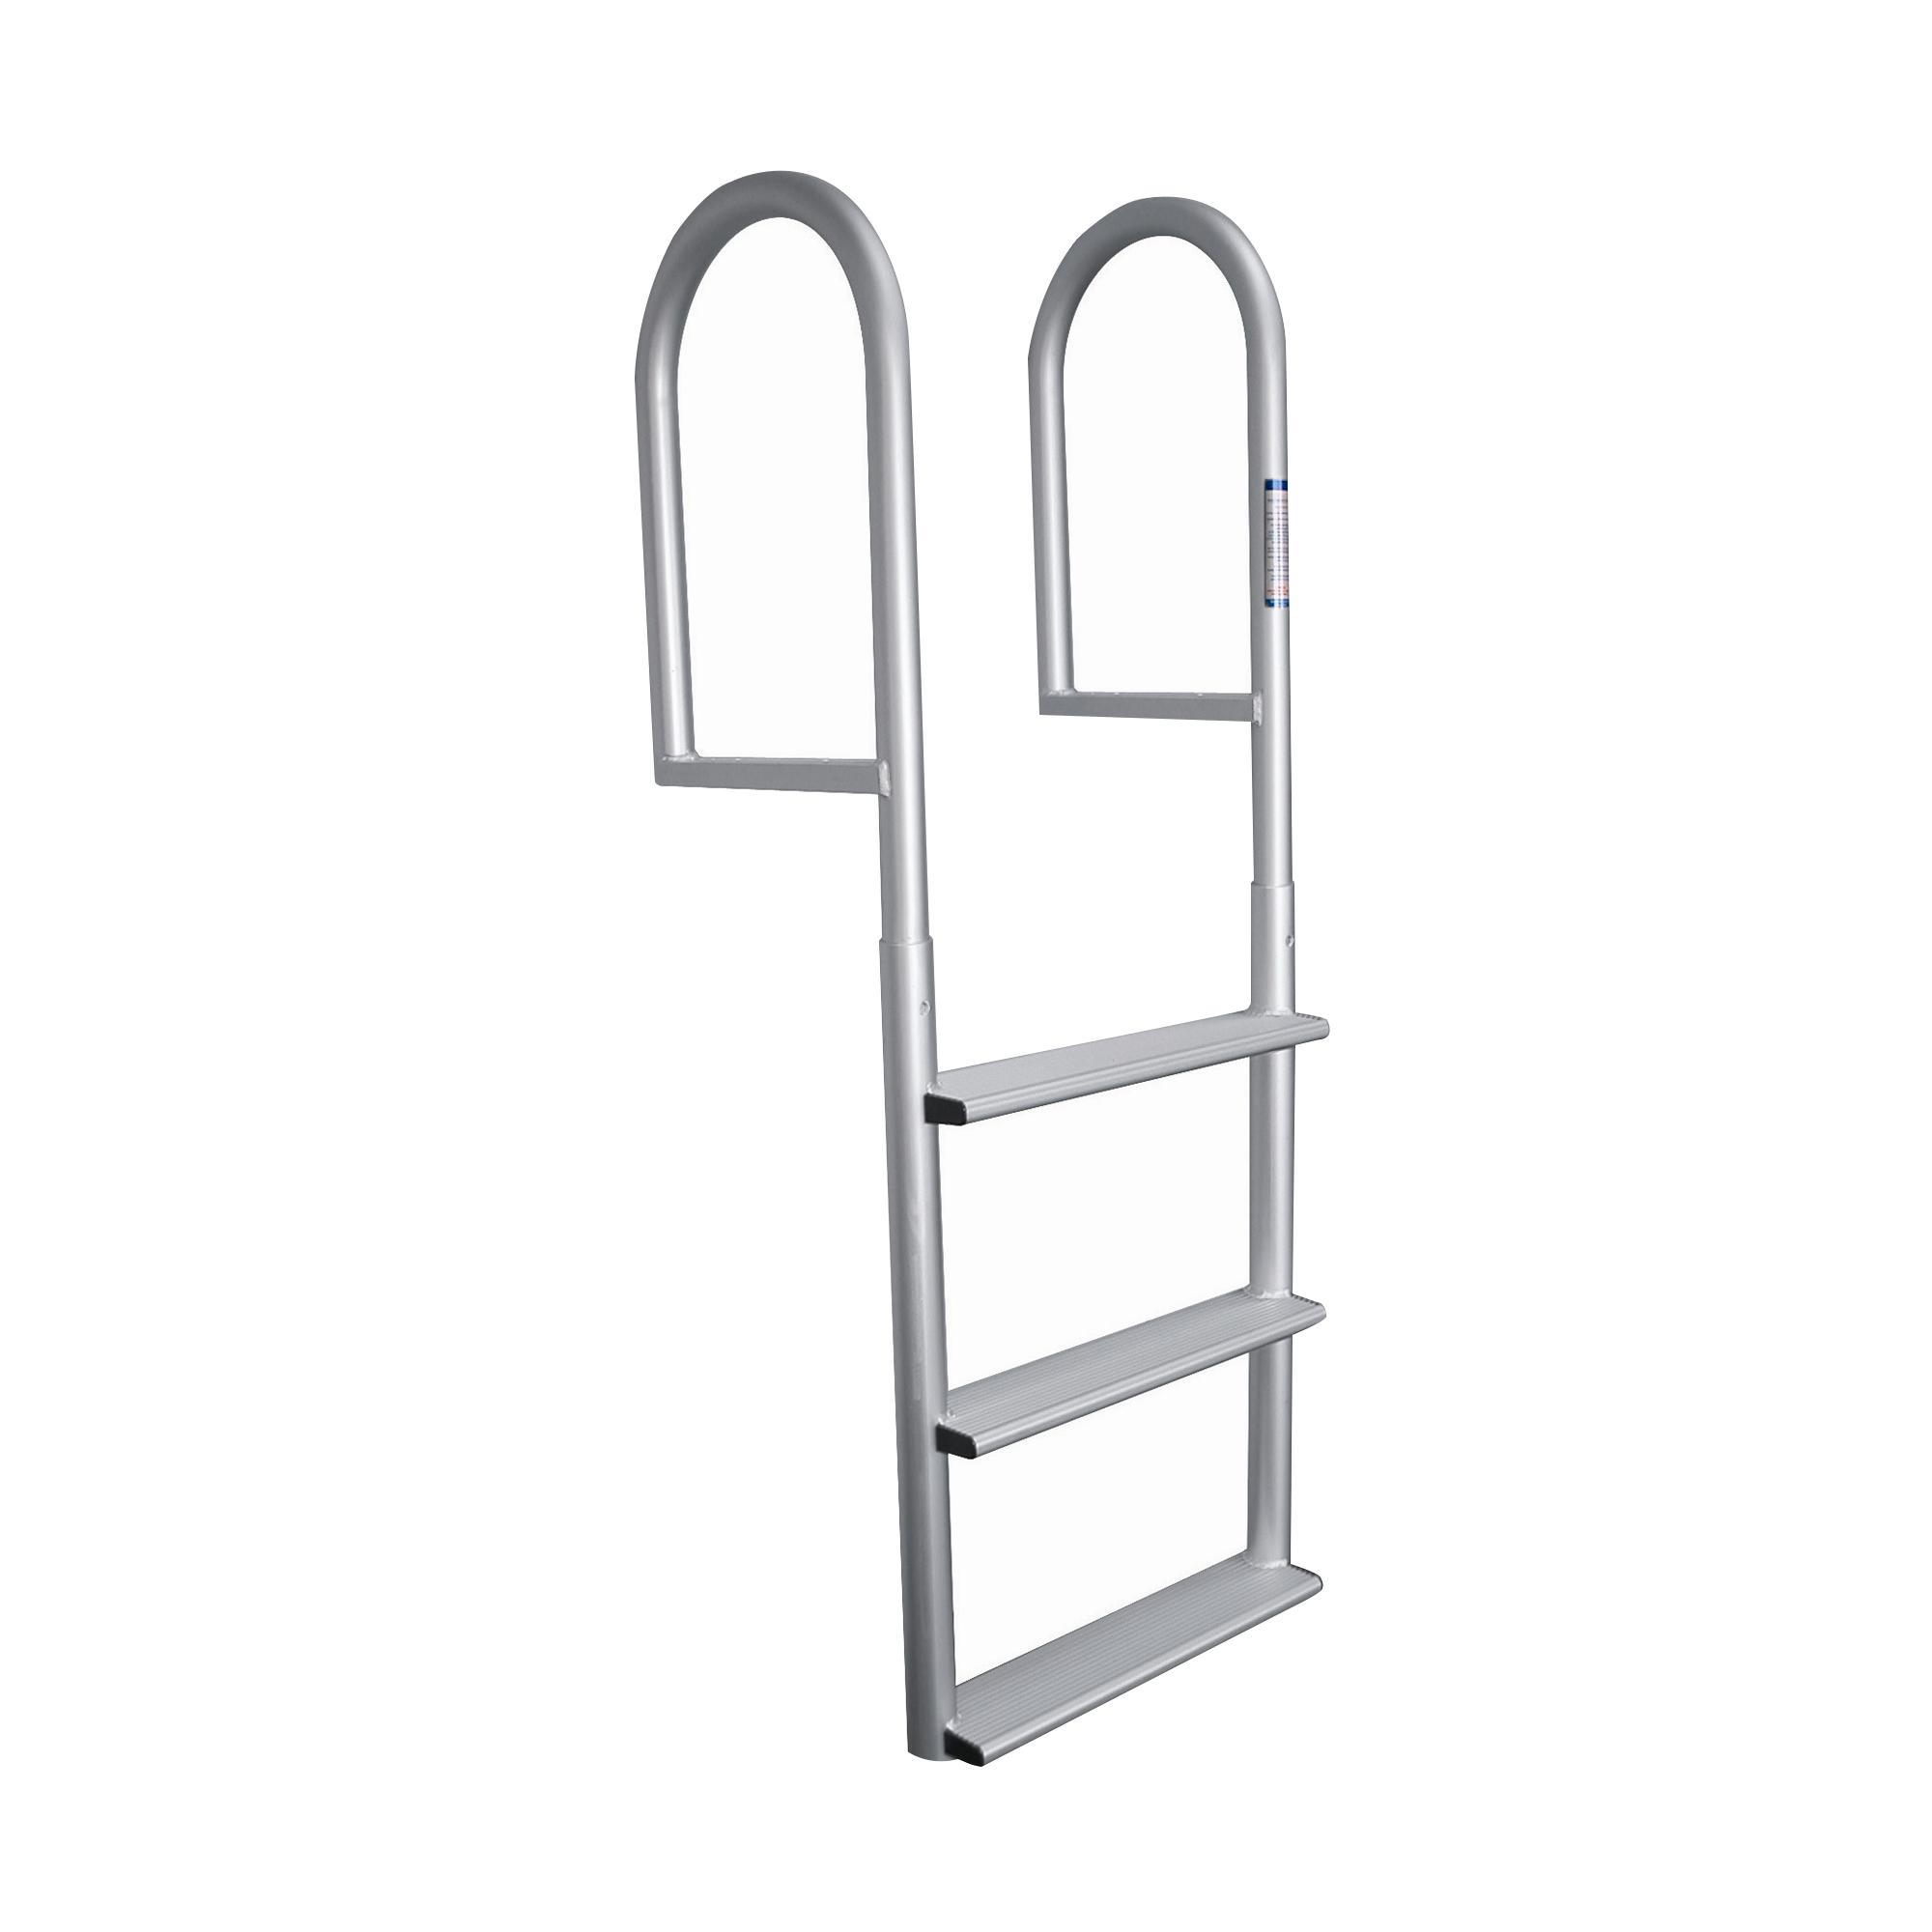 Dockmate Stationary Wide-Step Dock Ladders